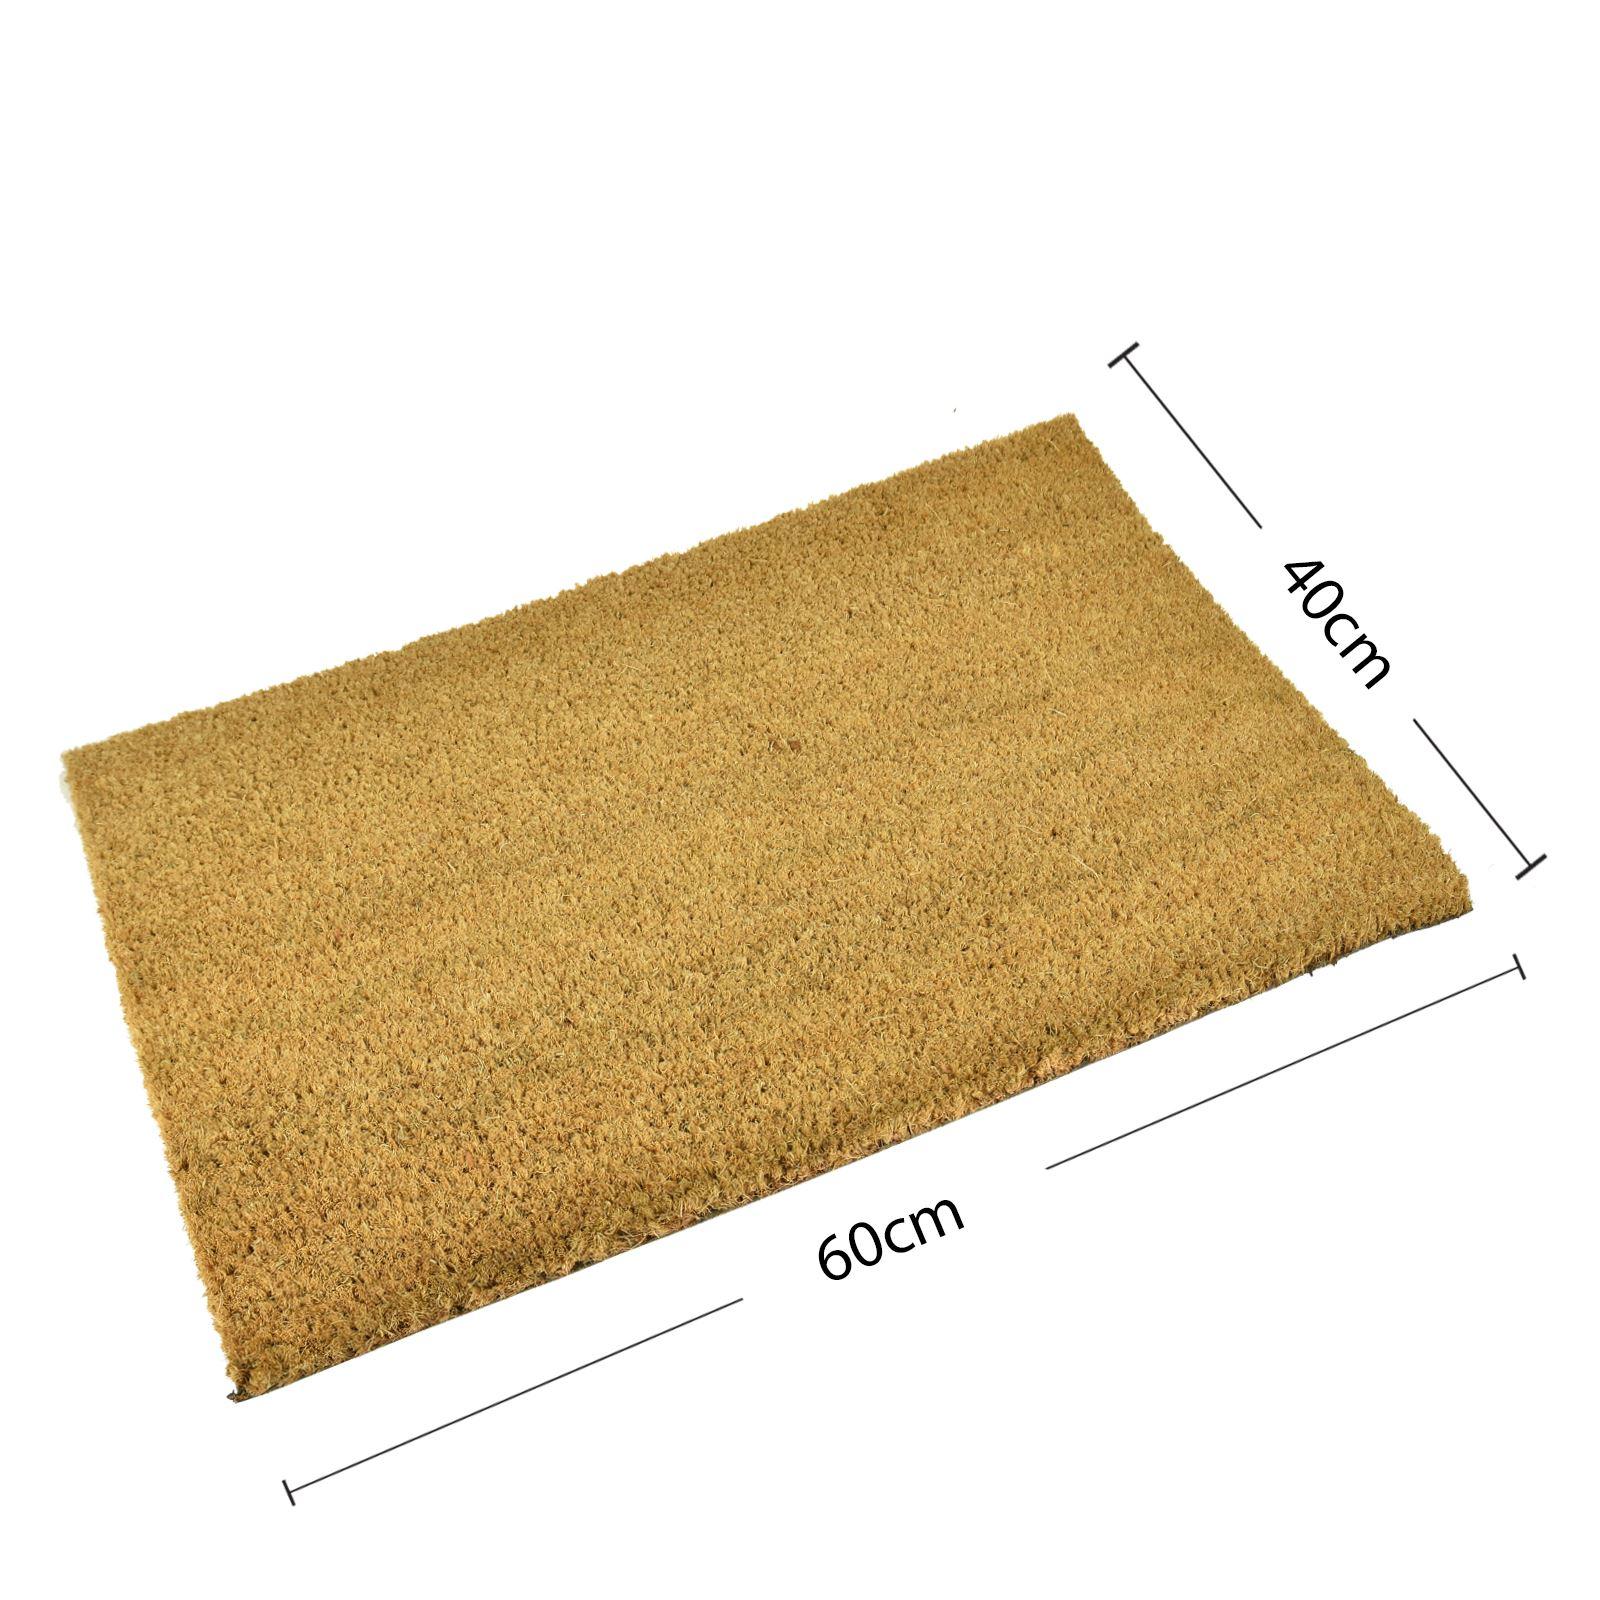 Plain-Non-Slip-Door-Mat-Tough-Natural-Coir-PVC-Back-Welcome-Doormat-40-x-60cm miniatura 96